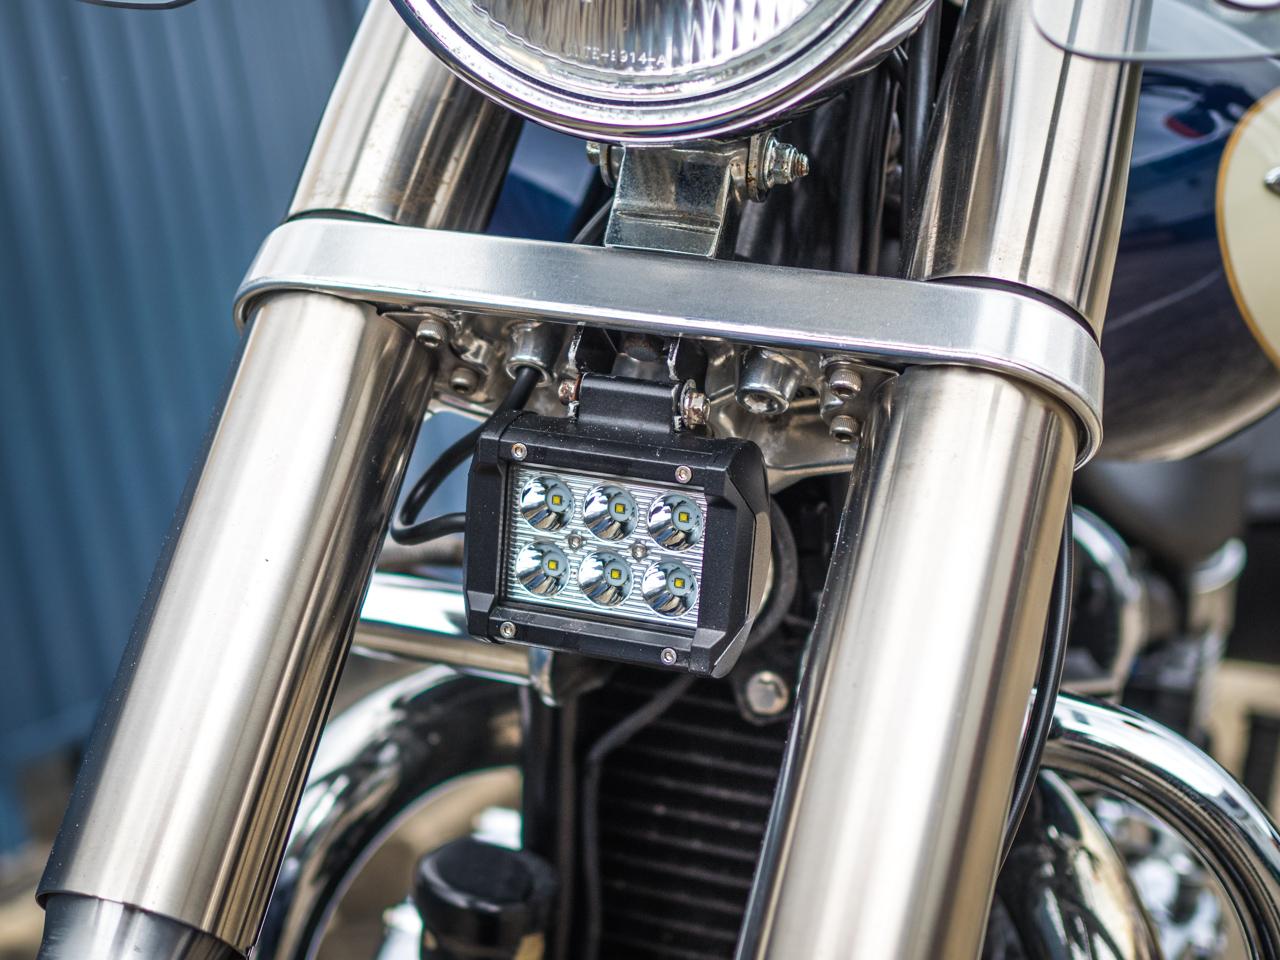 Thunderbird America Dome//Silver Handlebar Grips Triump-h Street Triple